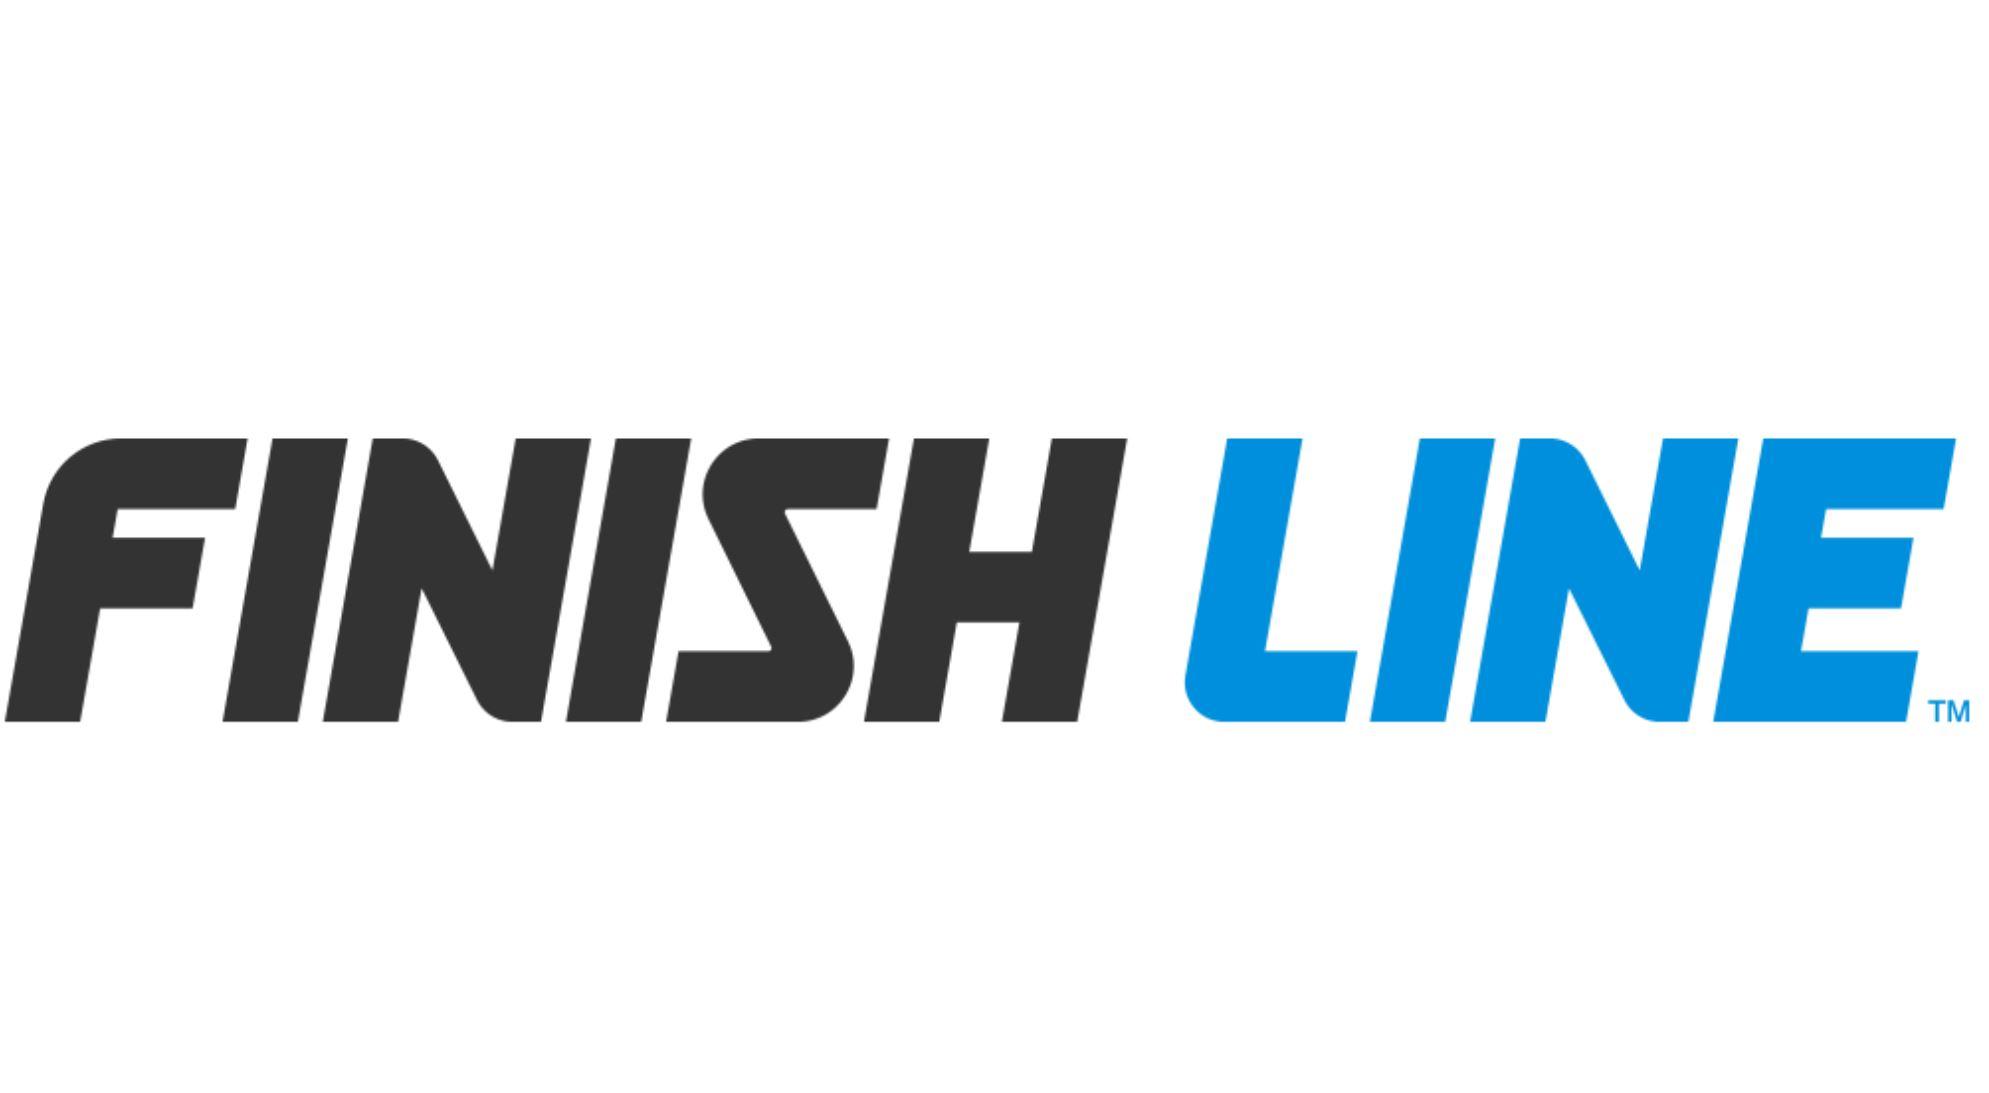 JD Sports Finish line logo